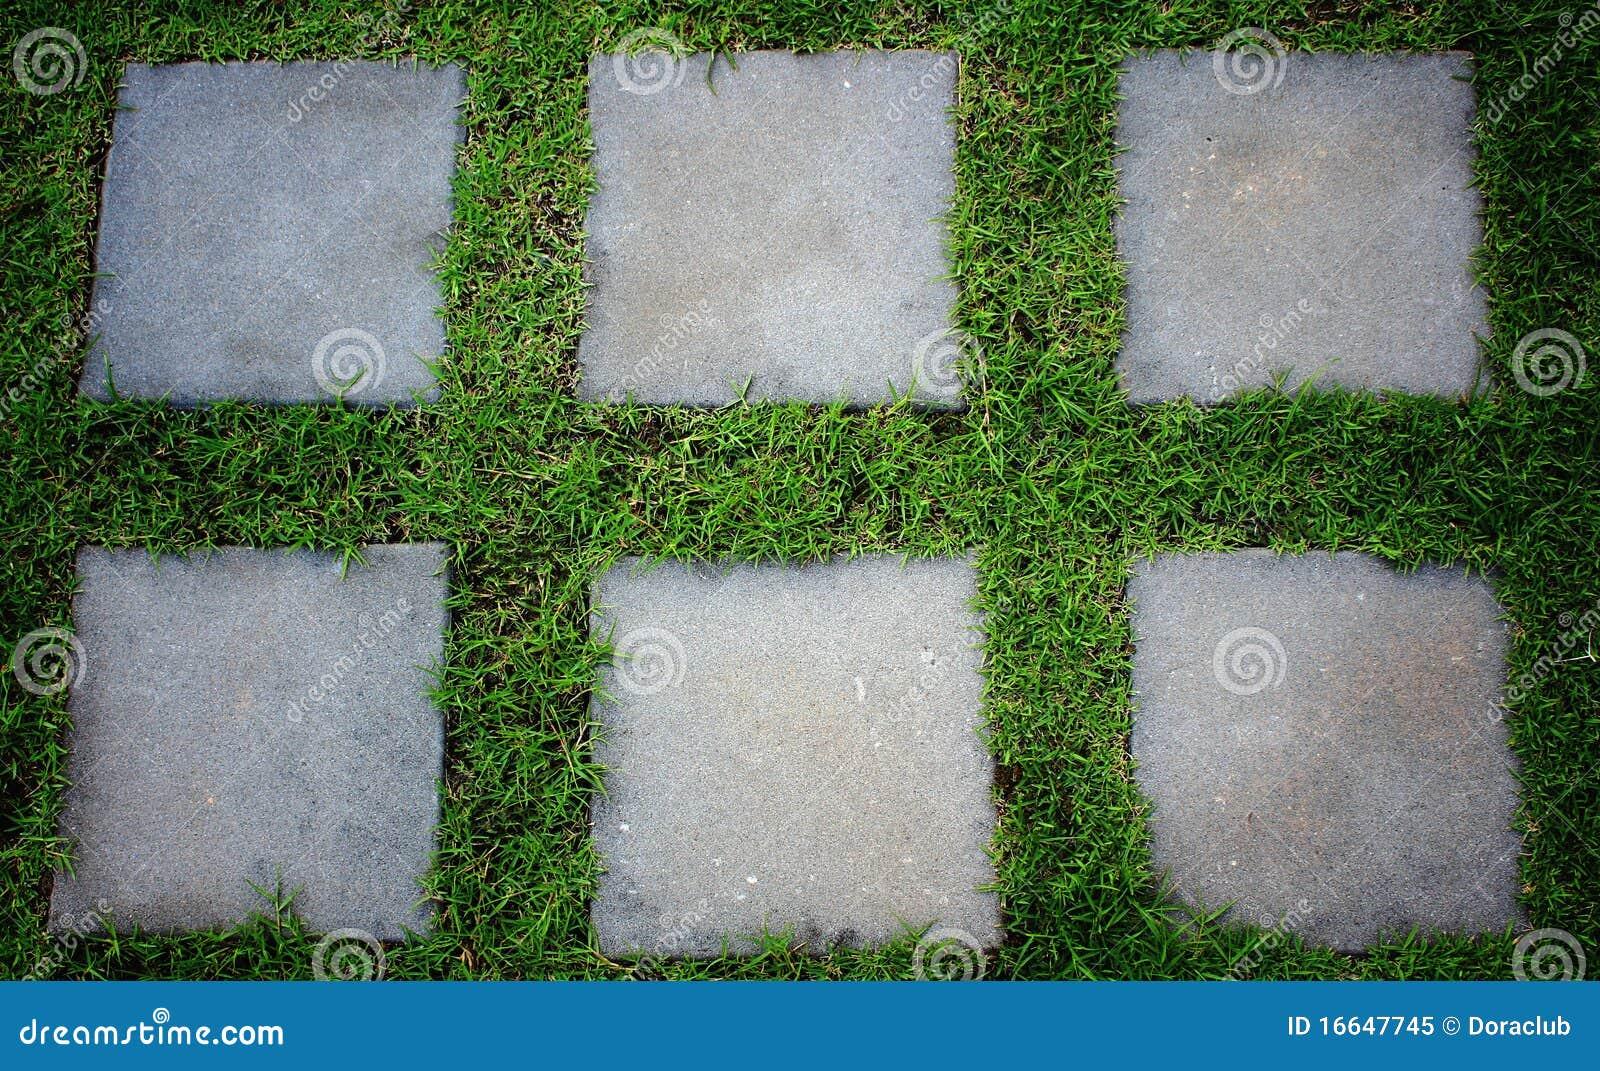 pedras jardim curitiba:Download trajeto de pedra do jardim com grama no jardim mr no pr no 2